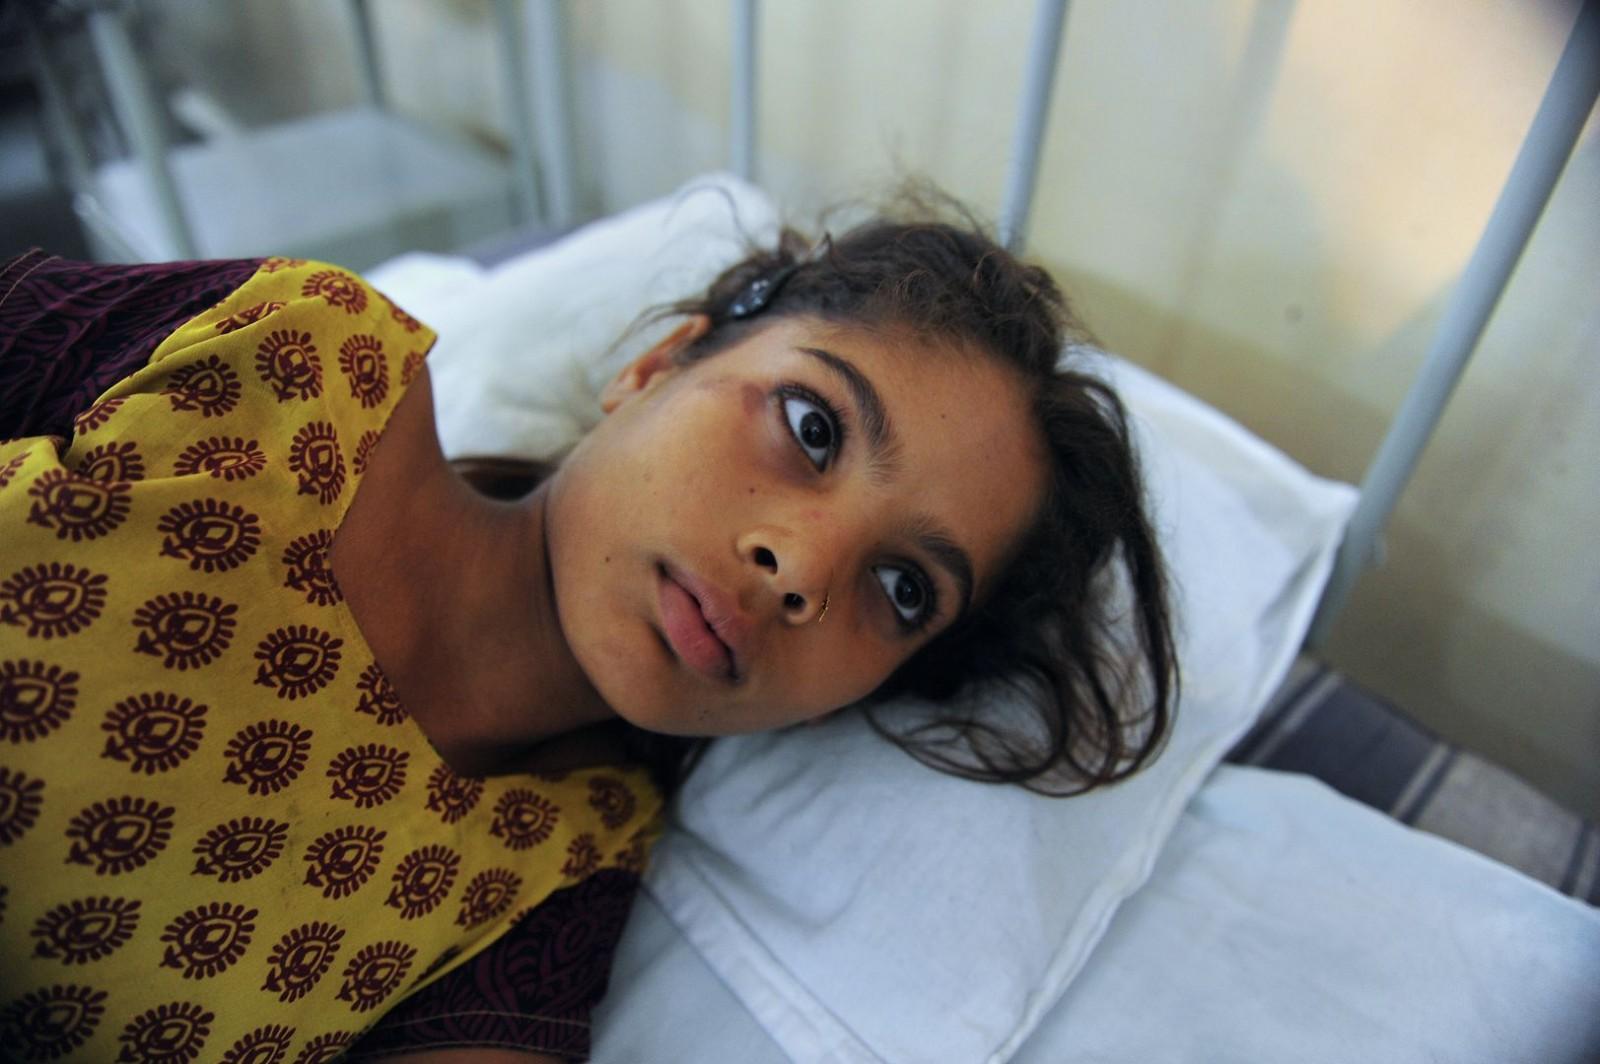 30 children, including newborns, die in India hospital